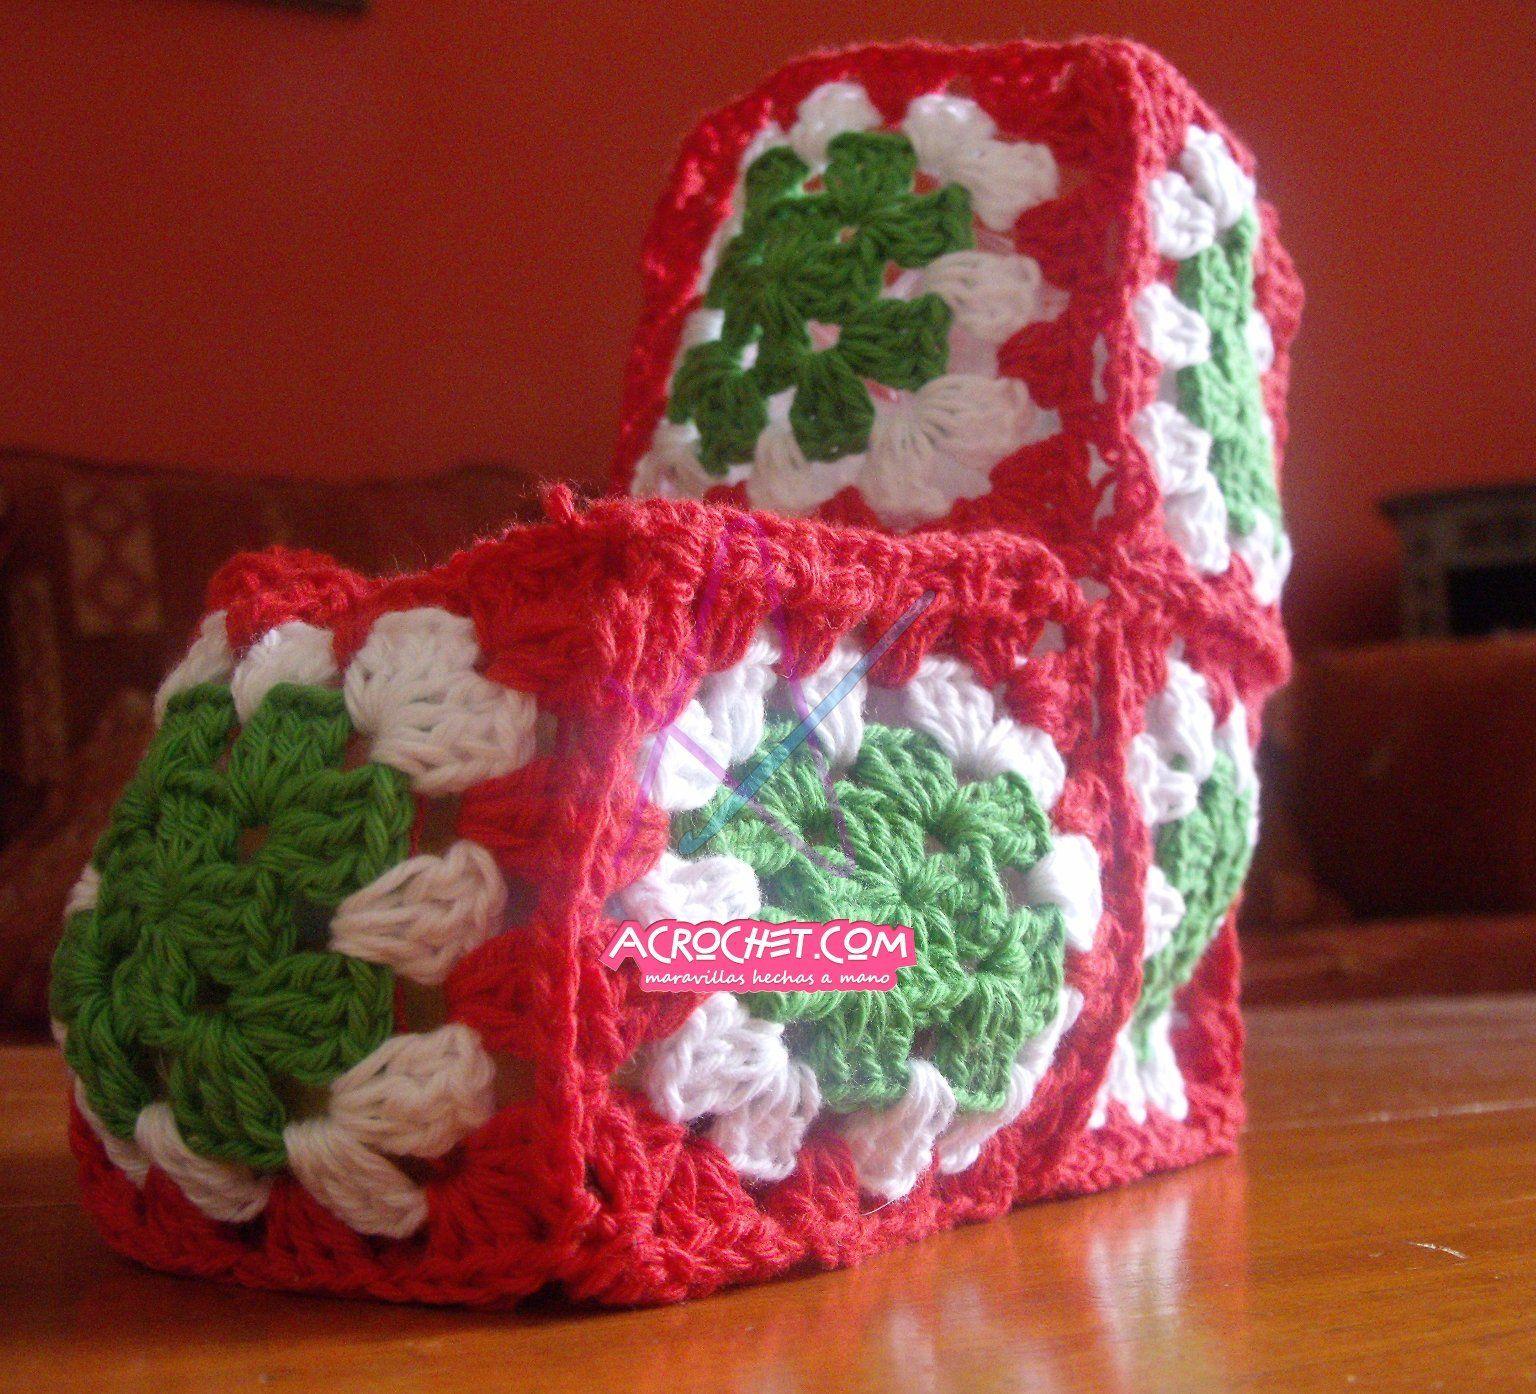 http://blog.acrochet.com/ninos/vestido-de-nina-para-verano.html